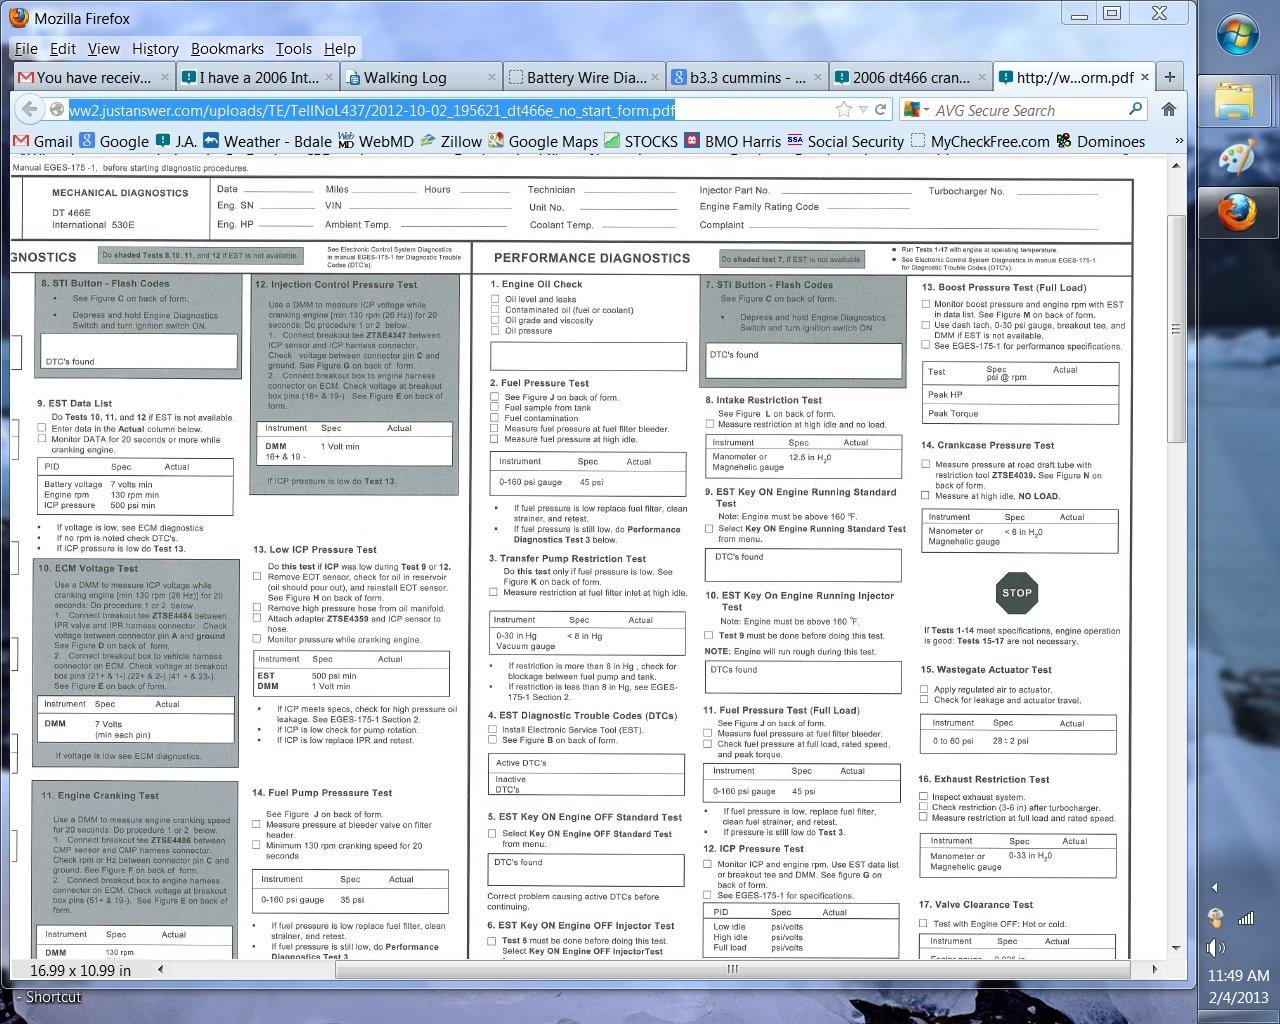 International Dt466 Parts Manual - xilusdocs